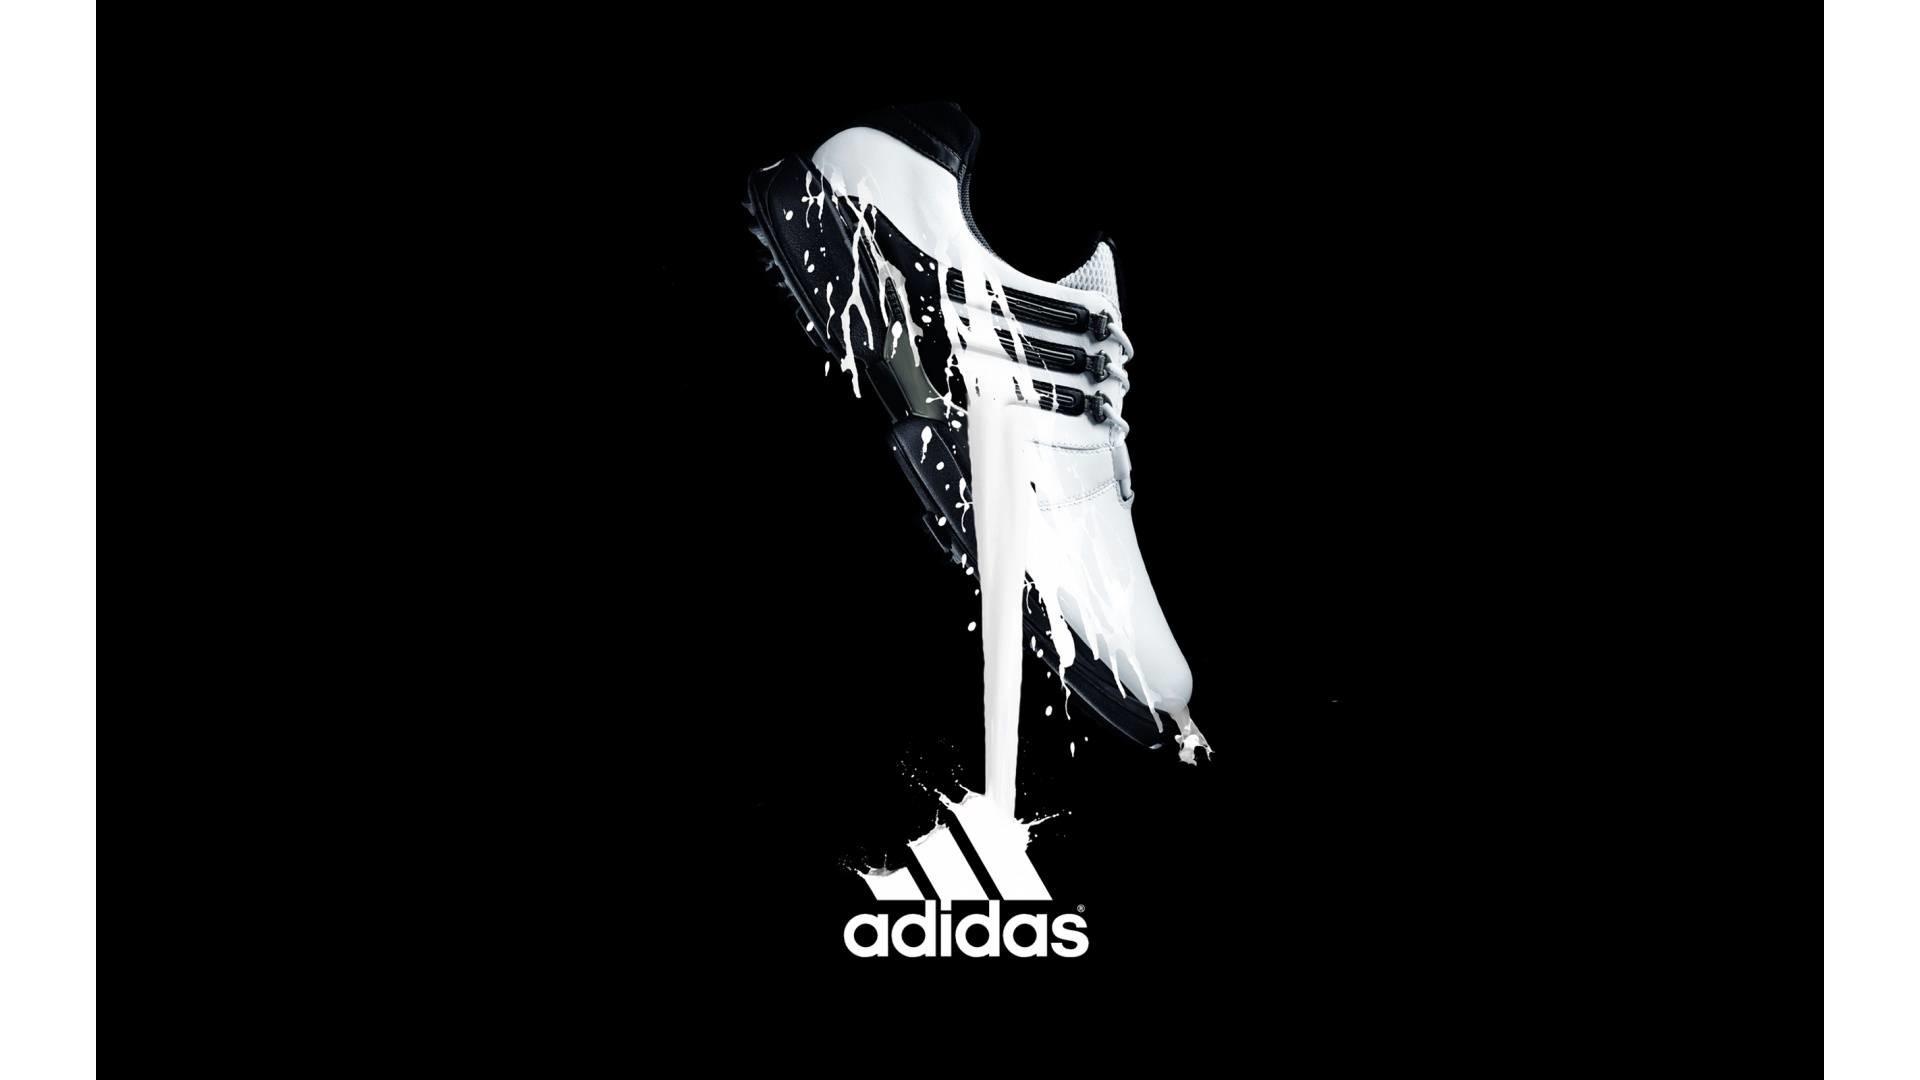 Wallpaper Logo Adidas Hq Pictures 13 HD Wallpapers | Hdwalljoy.